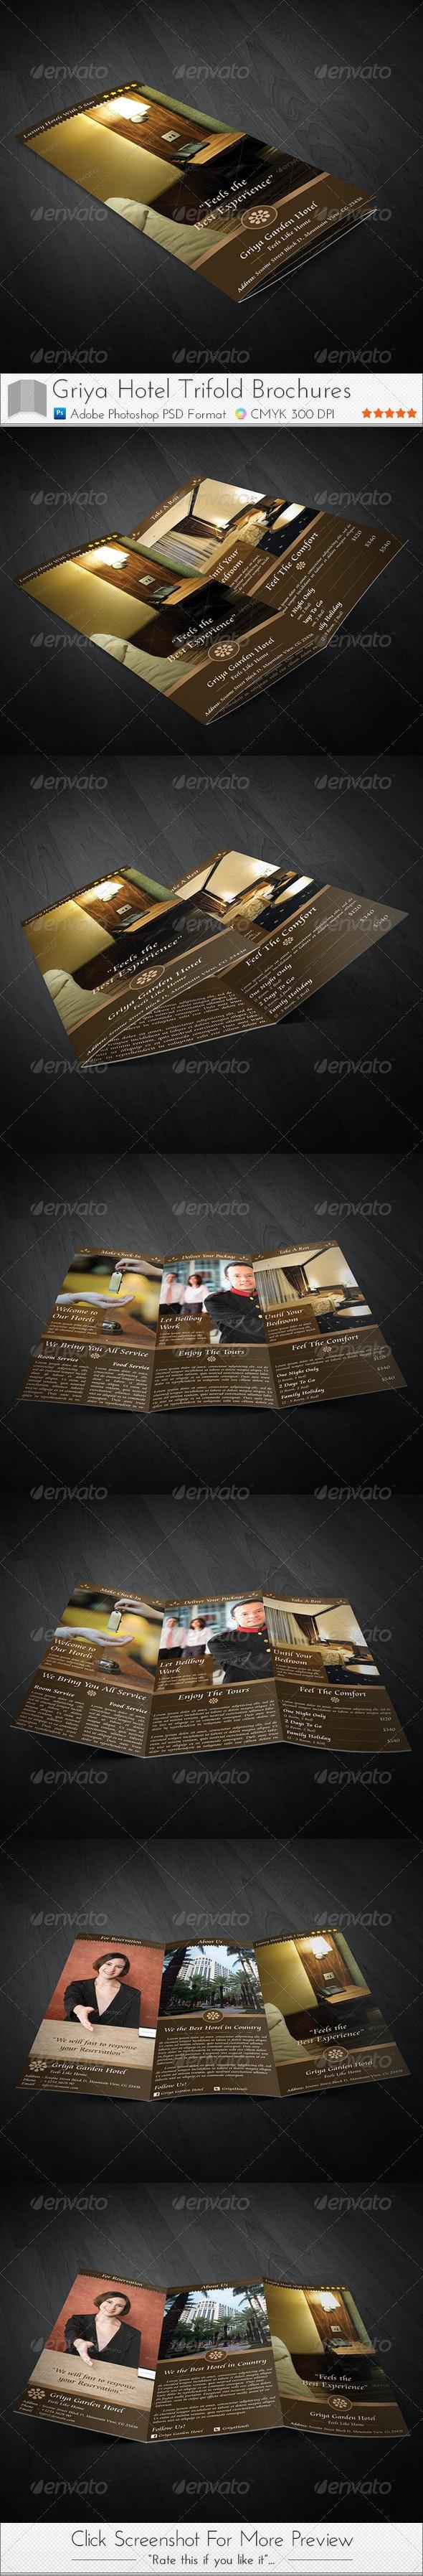 Griya Hotel Trifold Brochure - Brochures Print Templates